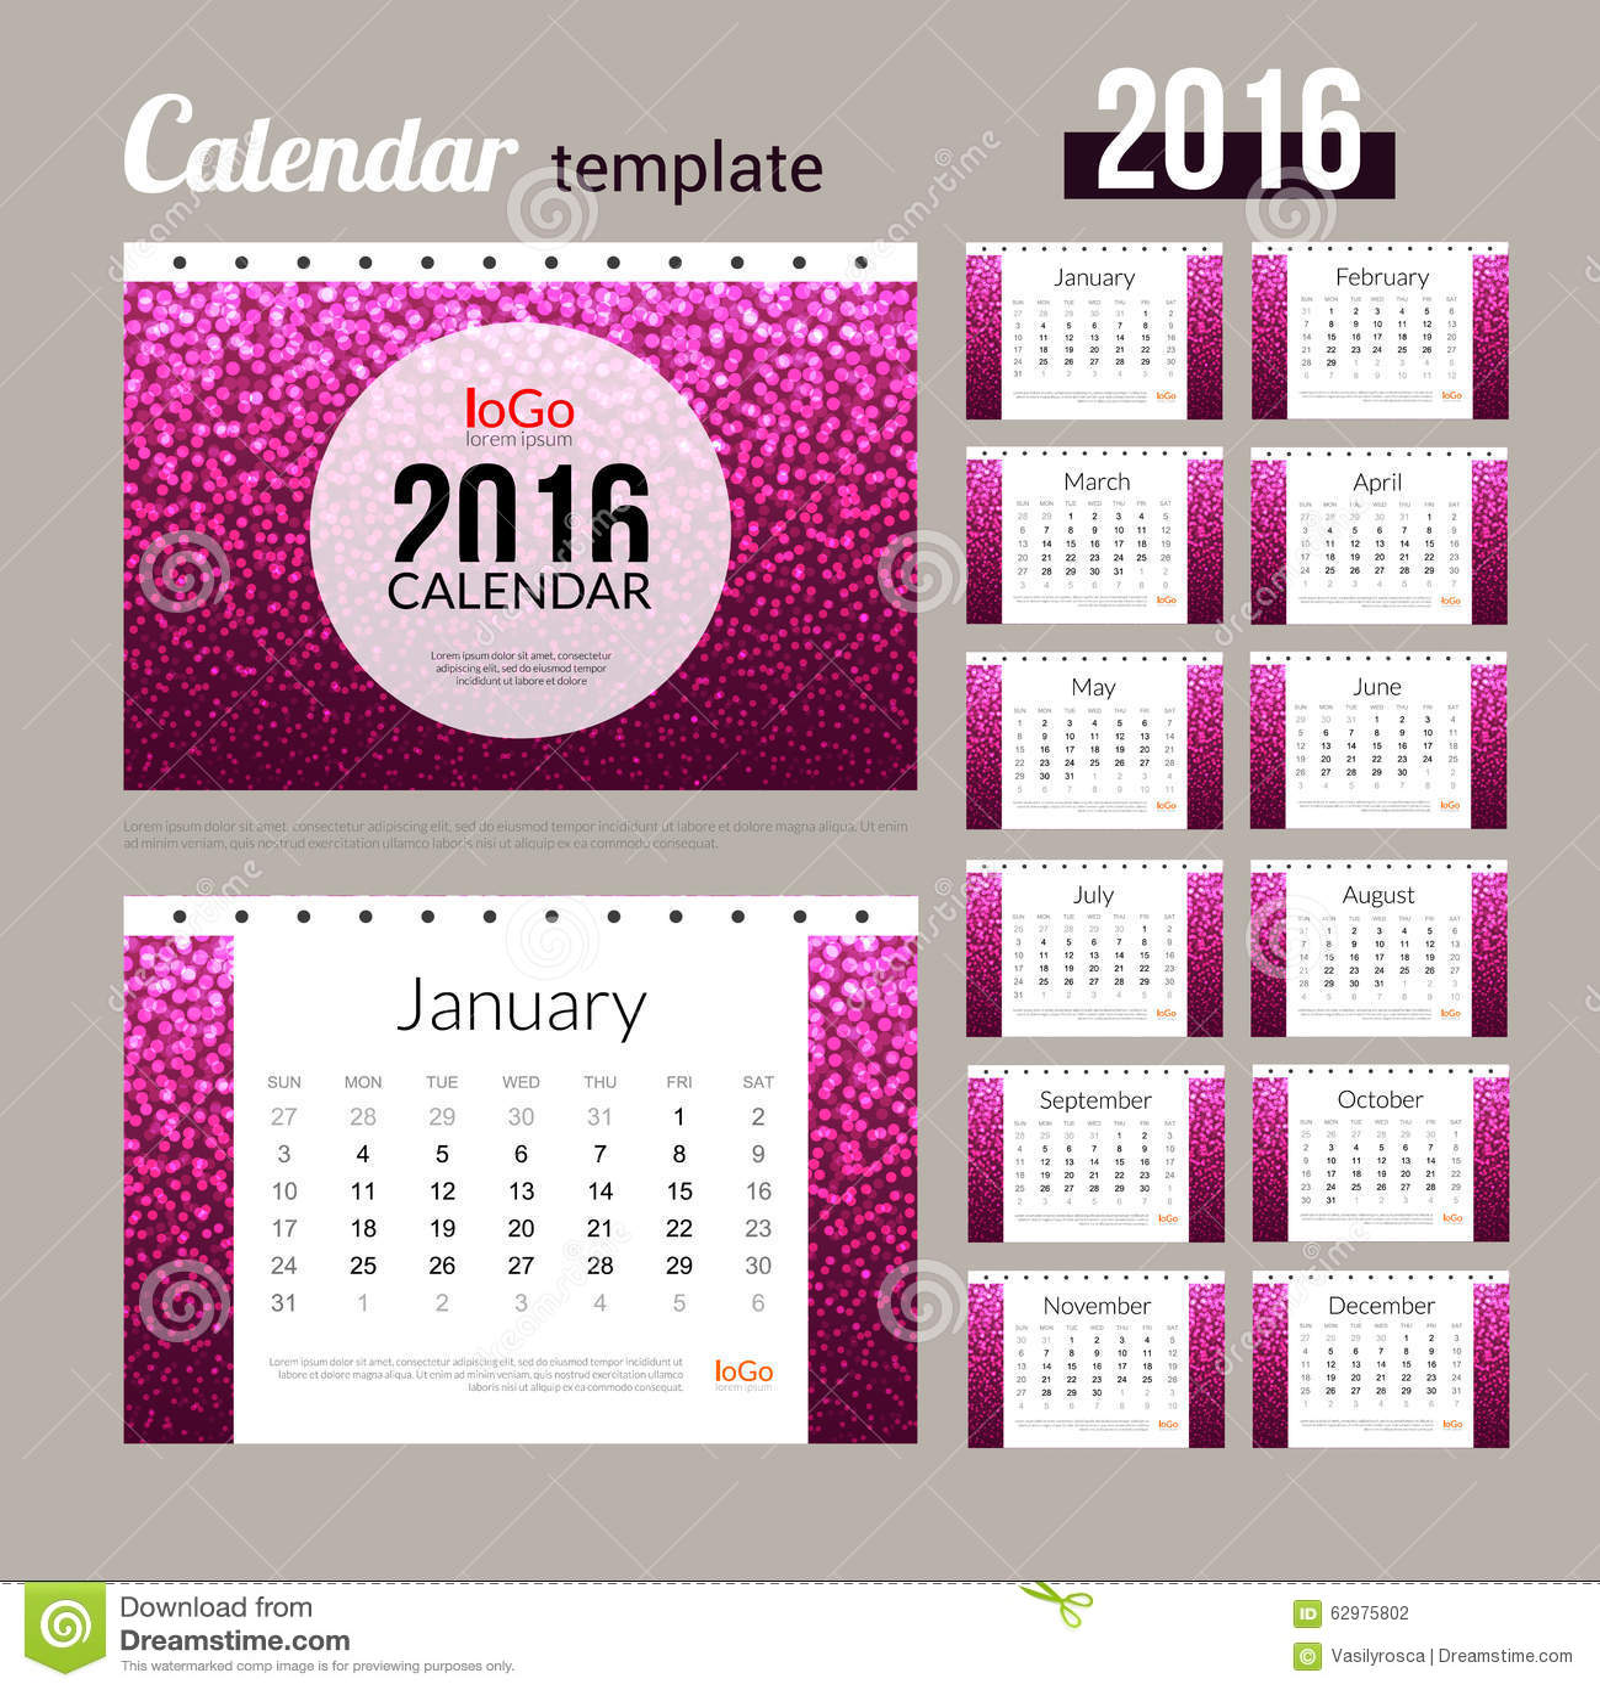 Calendar Design Pattern : Desk calendar vector design template with colorful